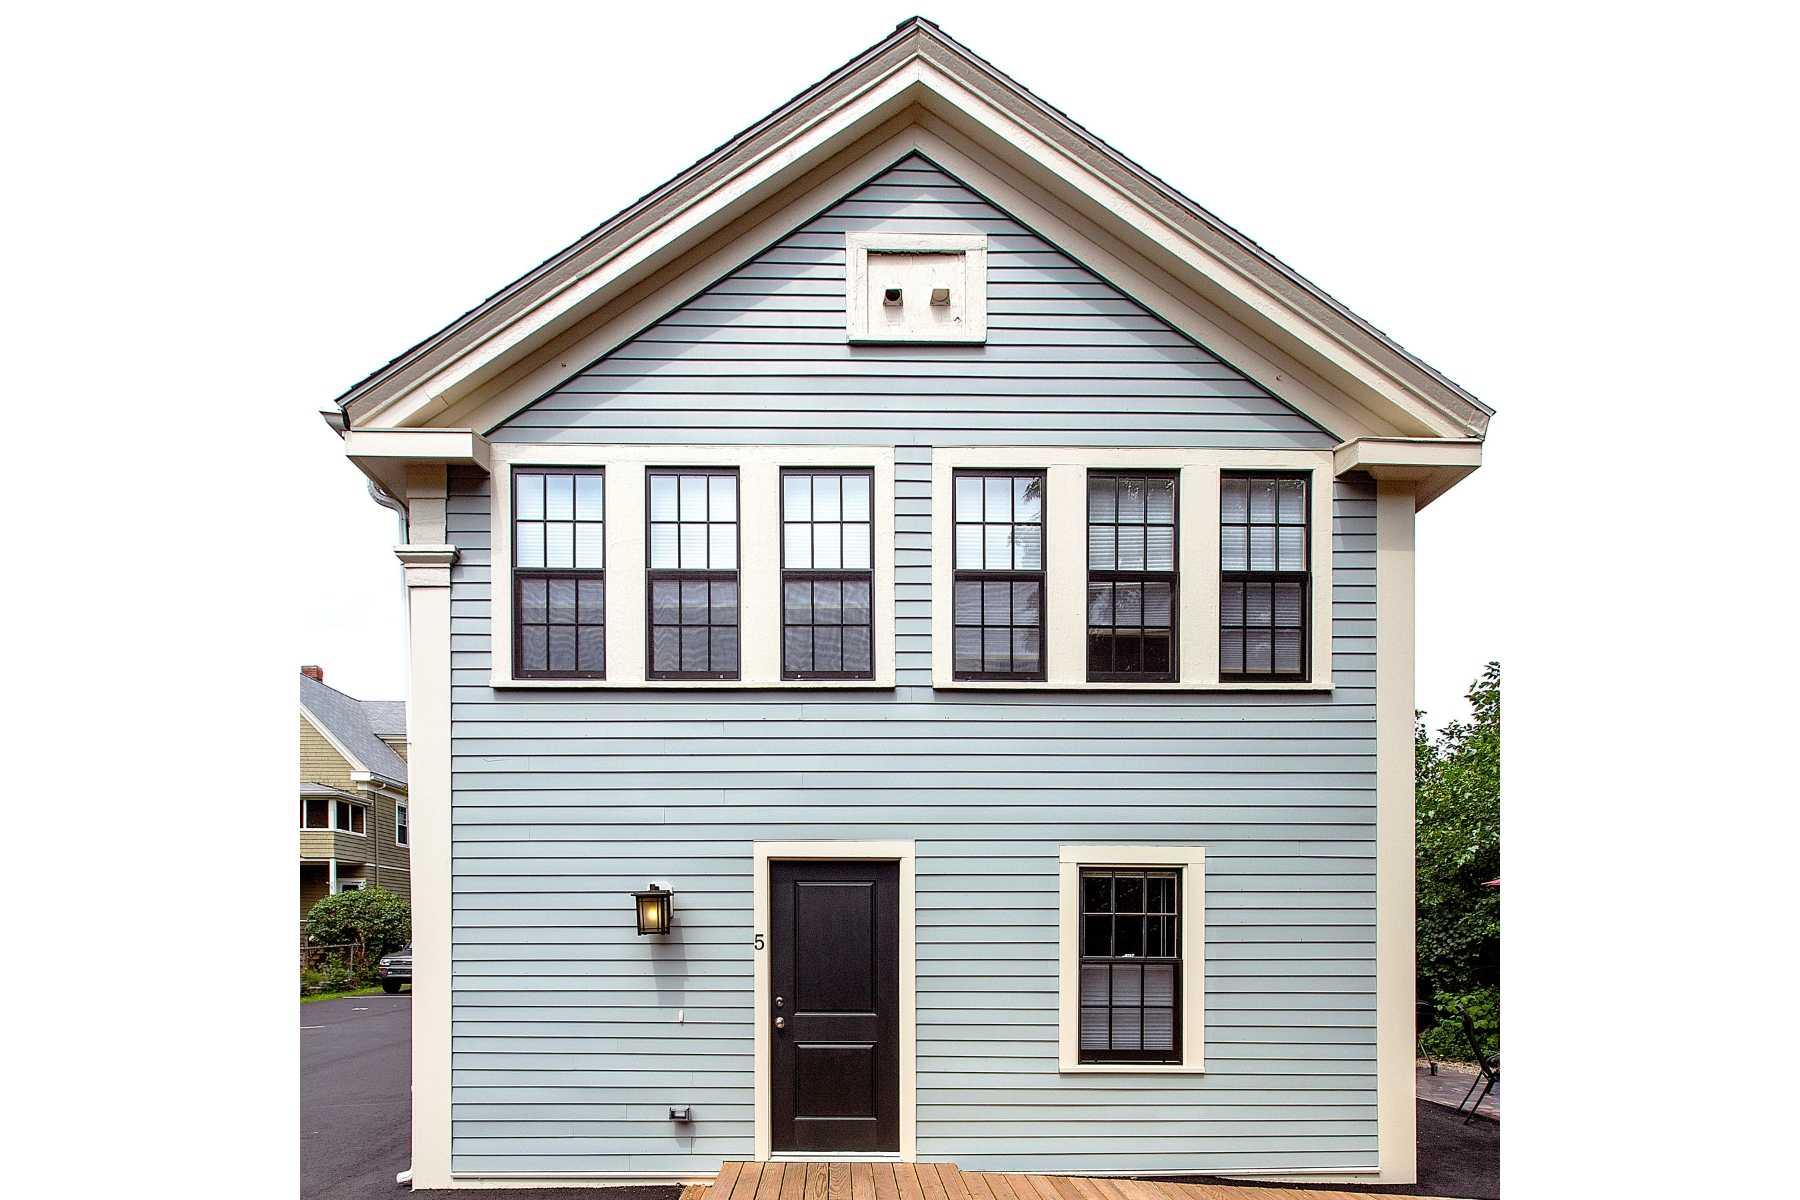 4-CapstoneCommunities-property-13 WinterStreet-Arlington.jpg